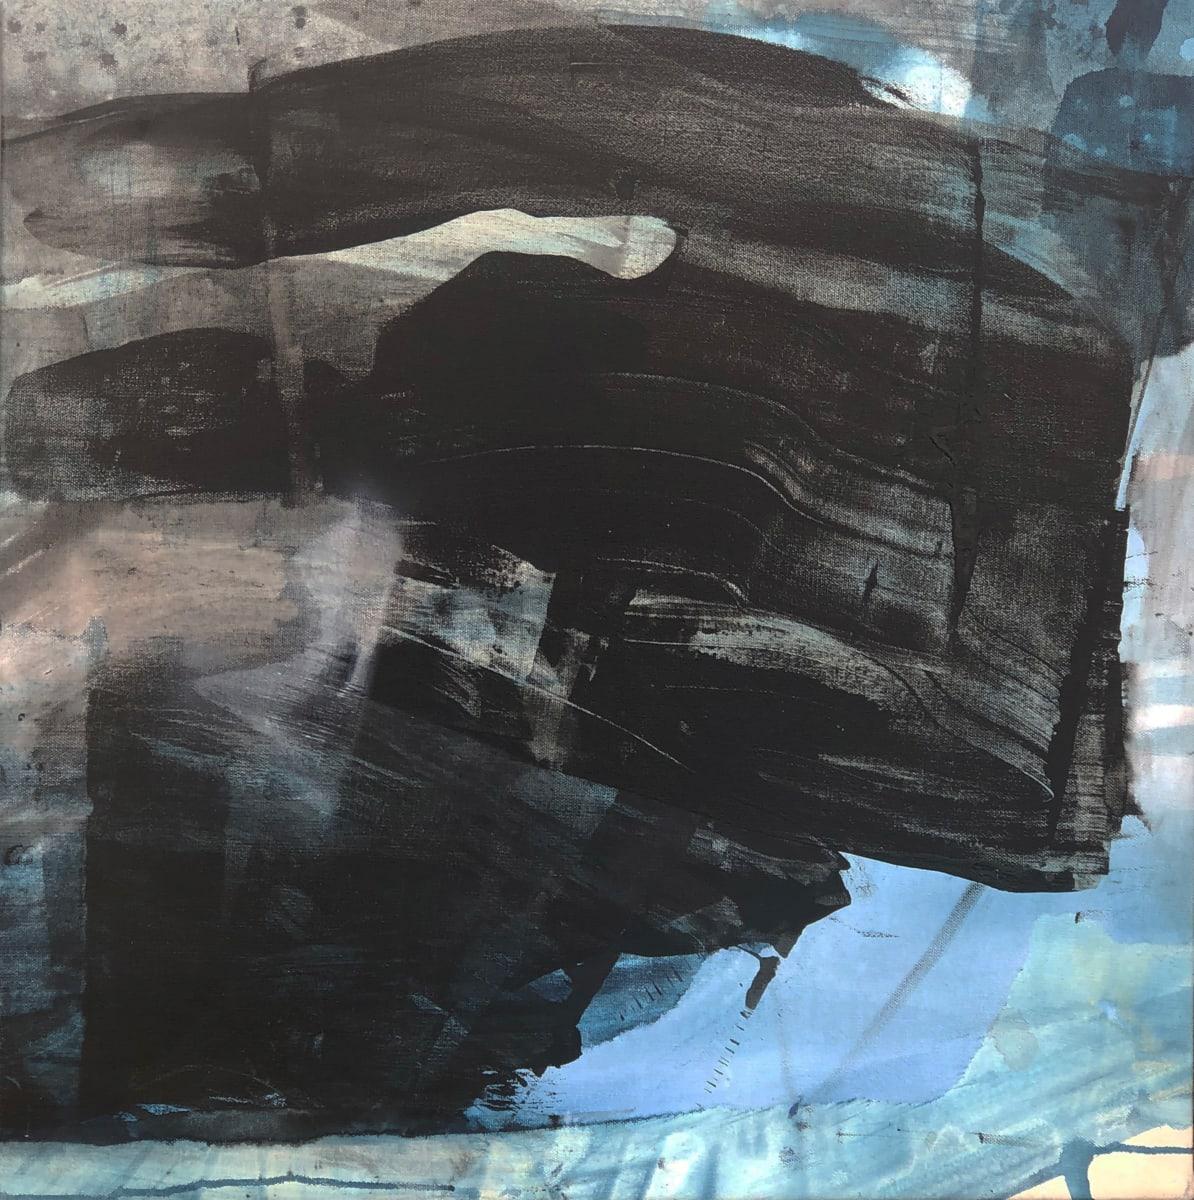 Eastern Winds, Western Change by Laura Viola Preciado